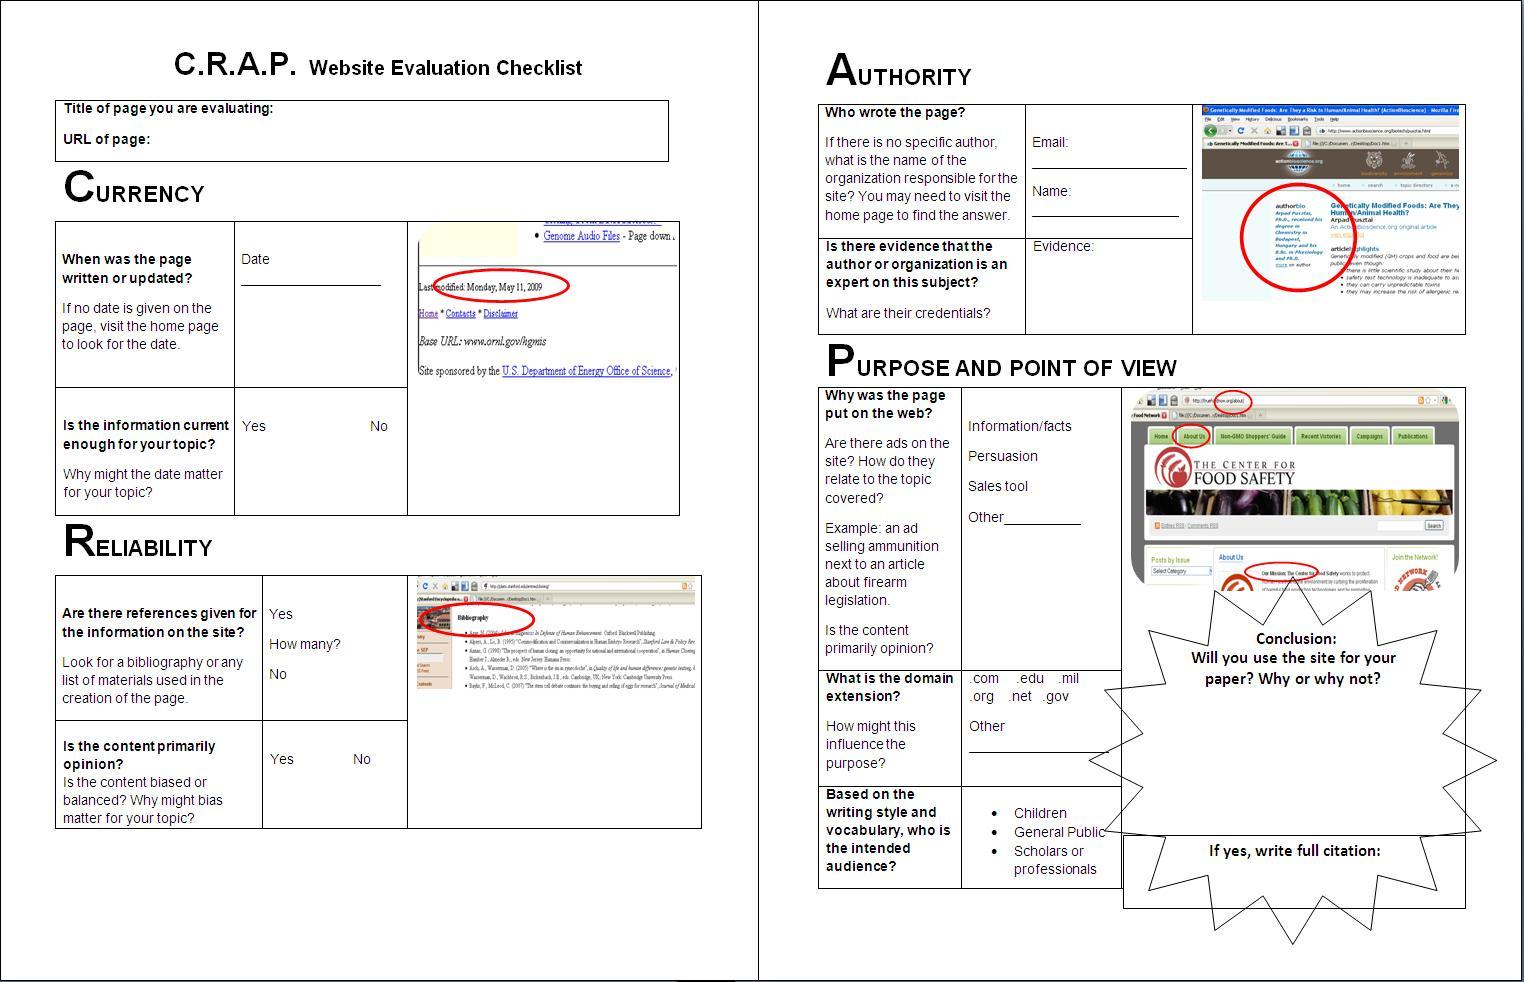 Worksheet C R A P Website Evaluation Checklist